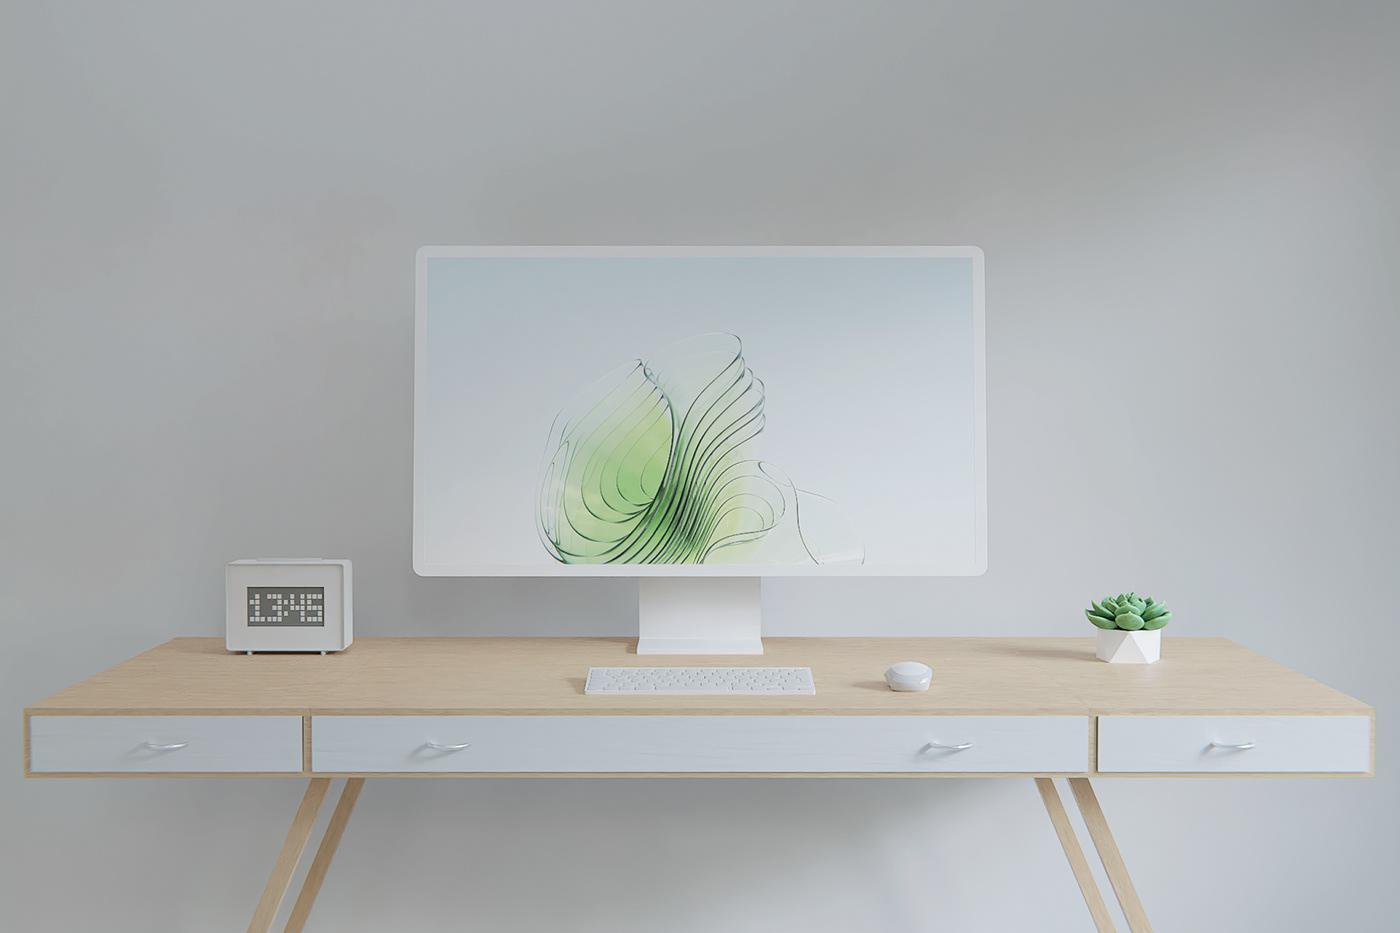 blender Desktop Wallpaper free wallpaper octane wallpaper Windows 11 windows wallpaper